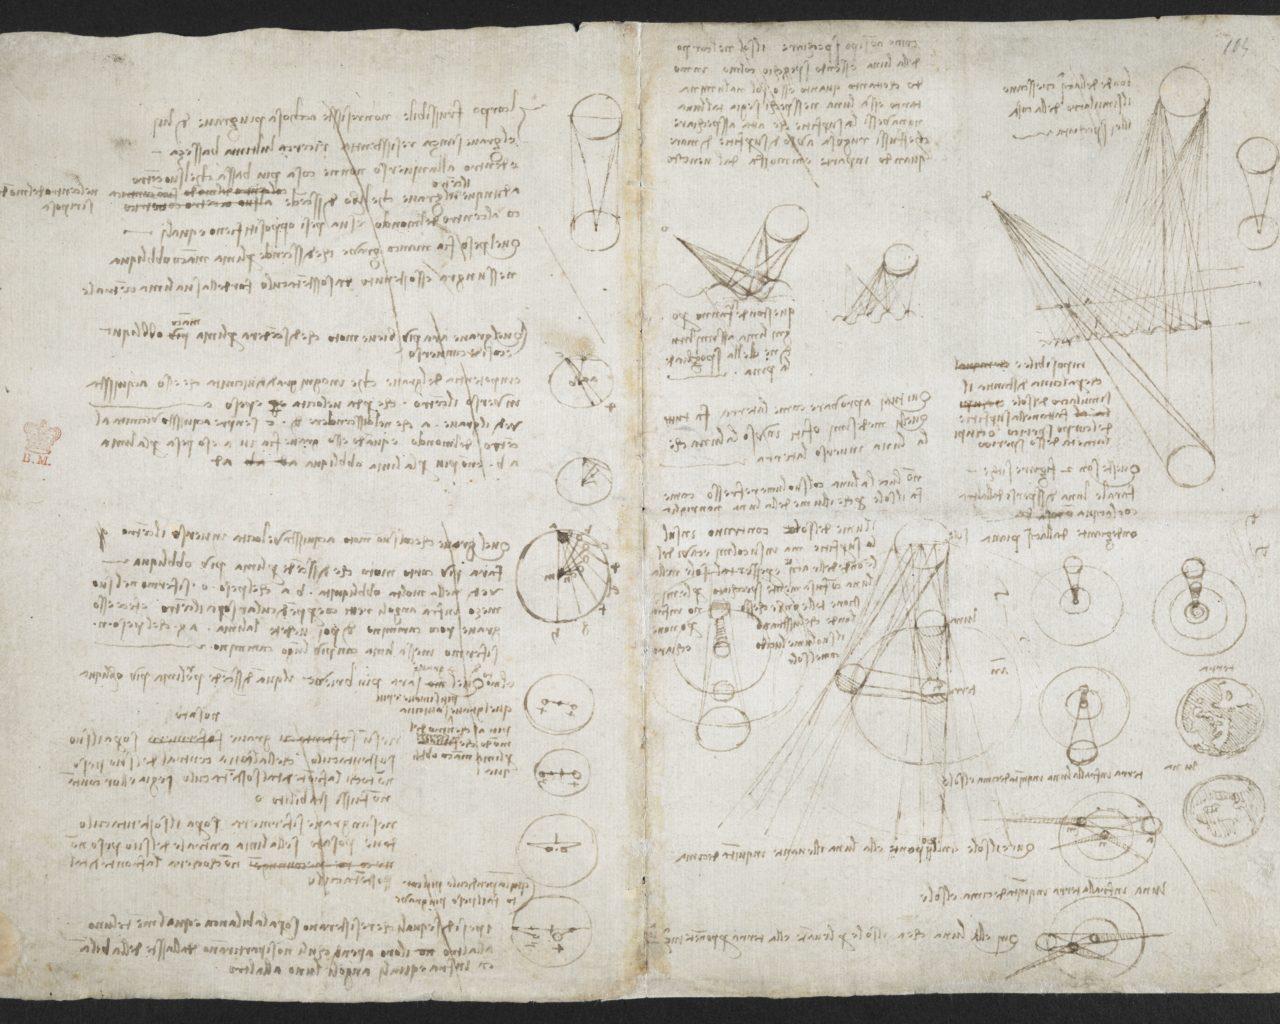 Astronomical notes and sketches, Leonardo Da Vinci's notebook (c) British Library Board